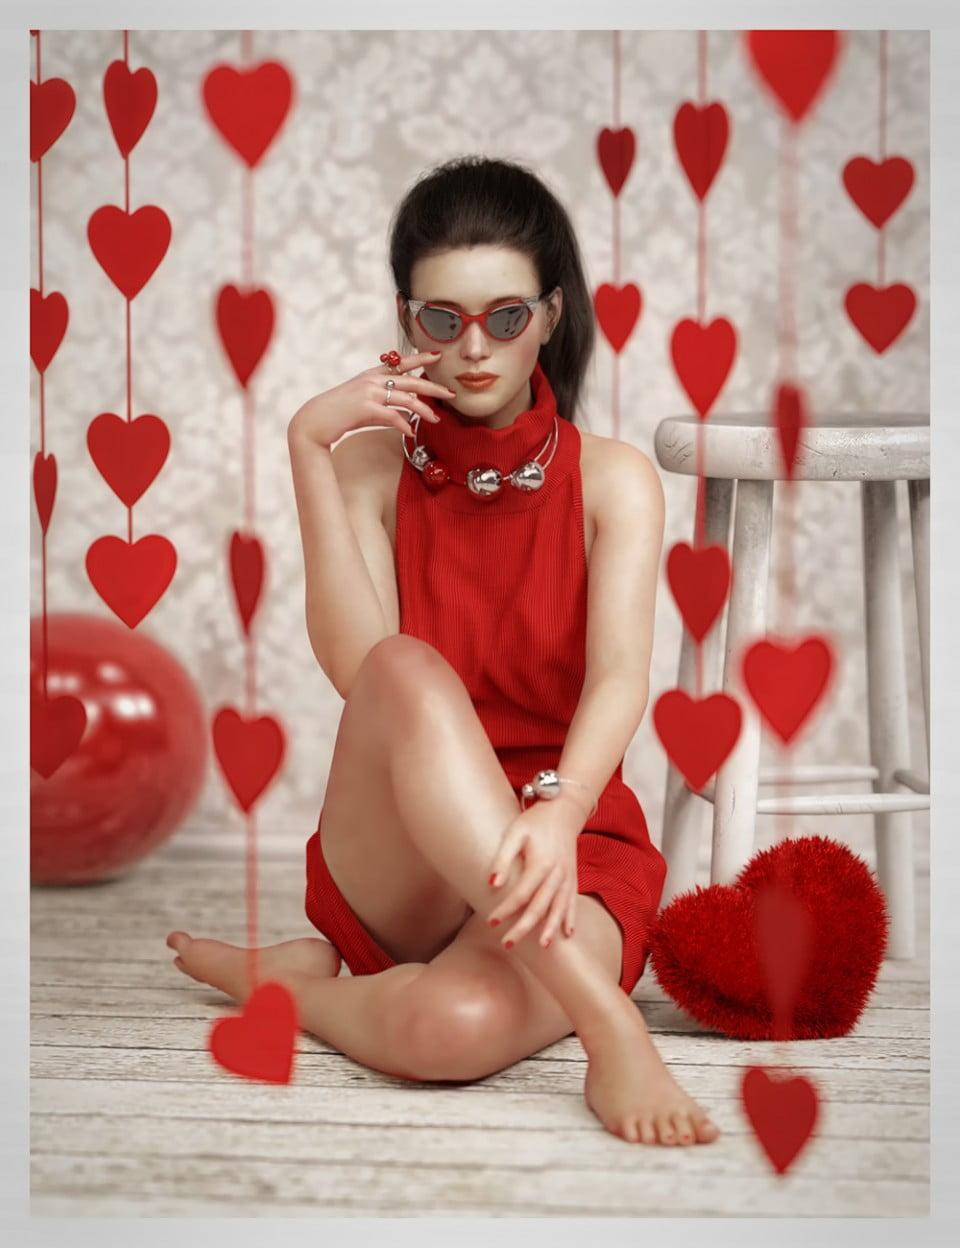 ES Valentine's Photo Shoot Props